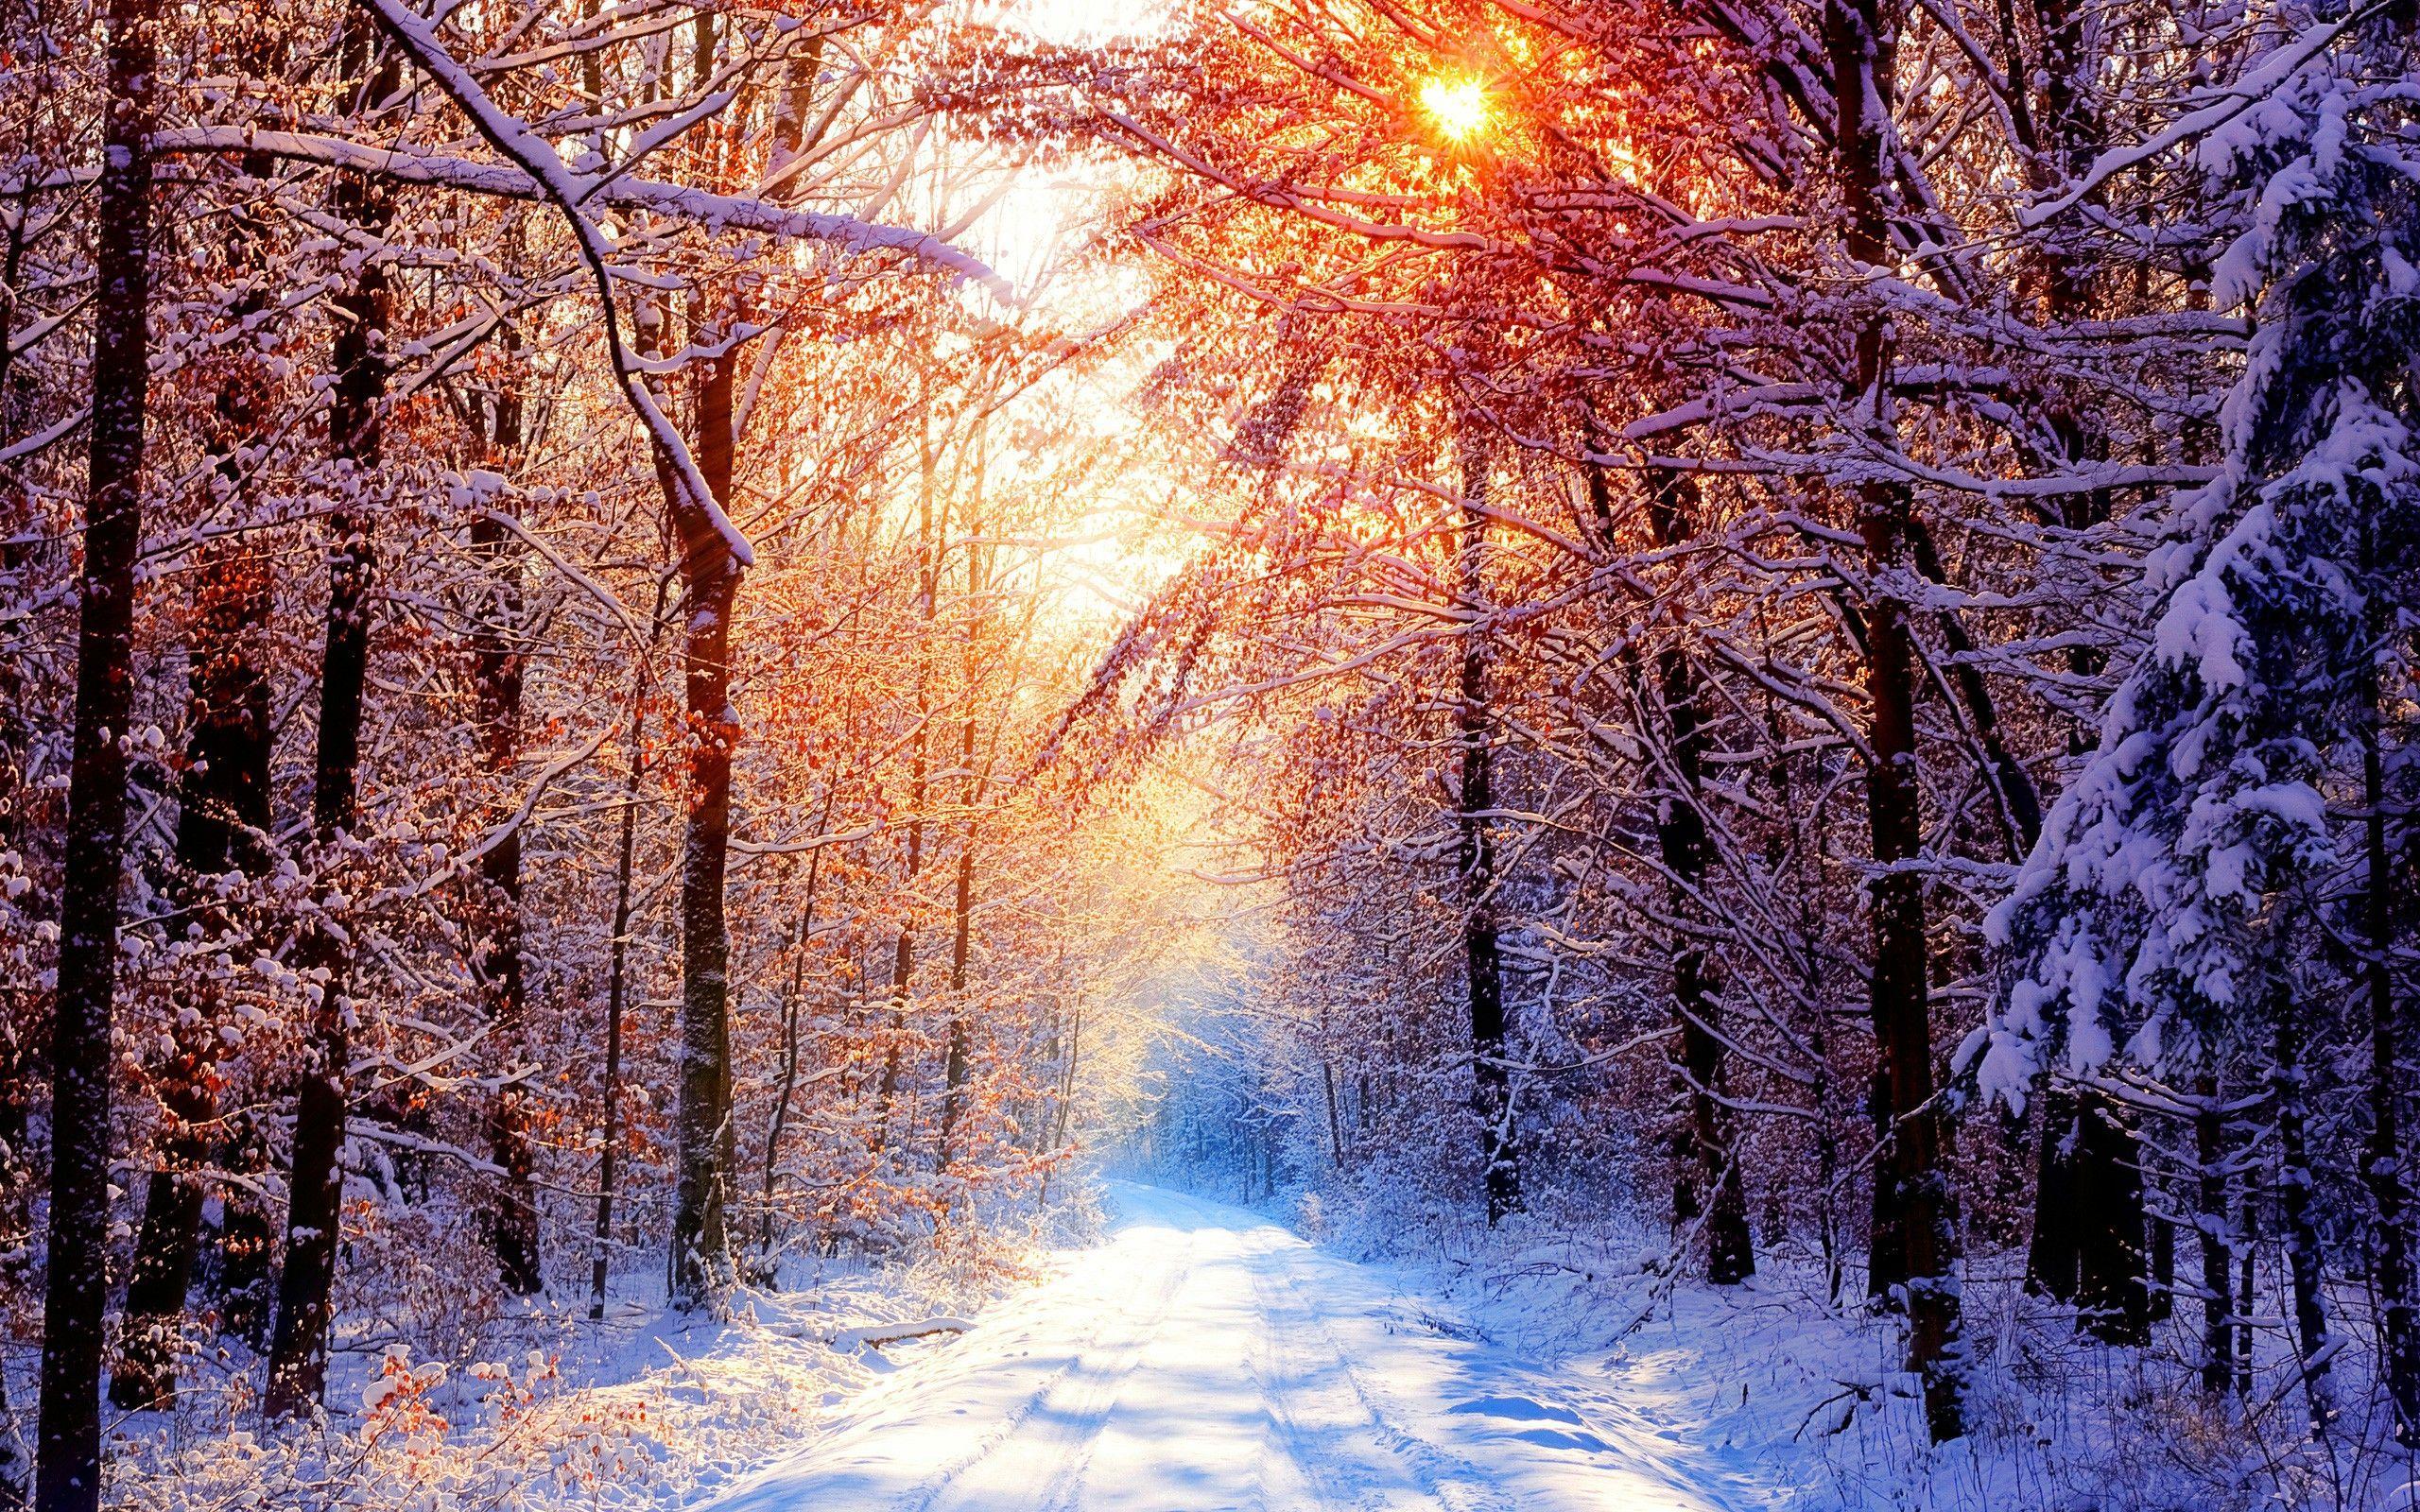 Winter Desktop Wallpaper Landschafts Tapete Winter Hintergrunde Winter Szenen